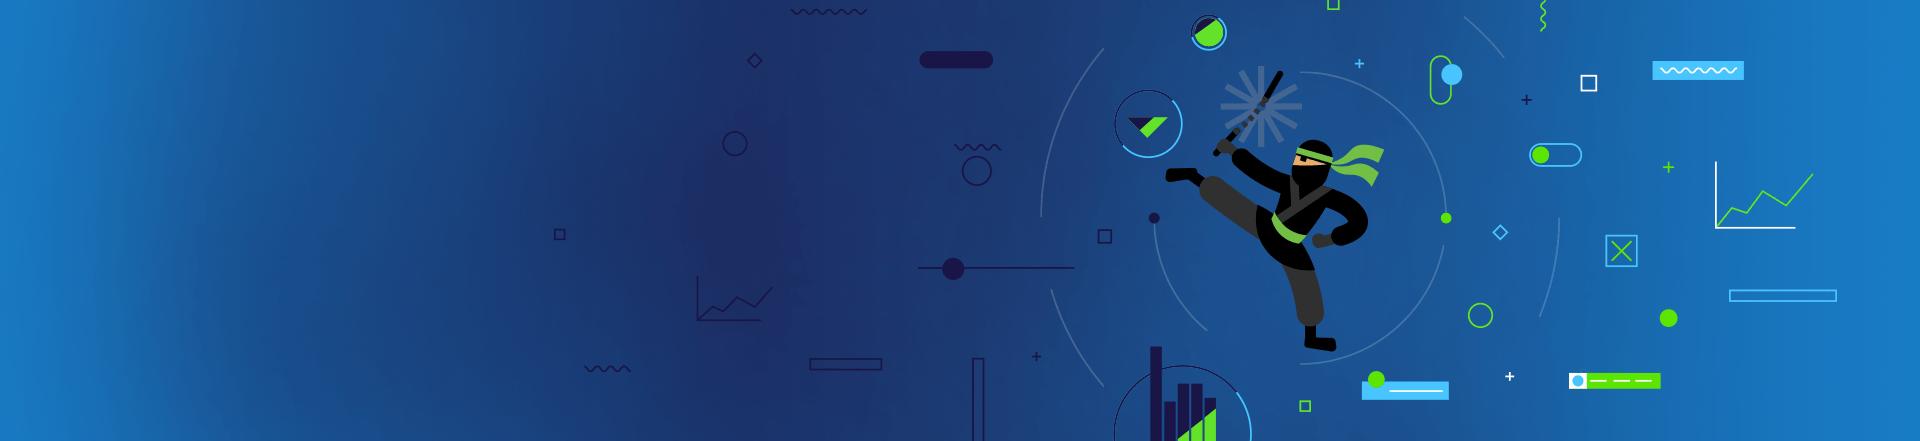 Telerik UI Tools R3 Release Webinar Header